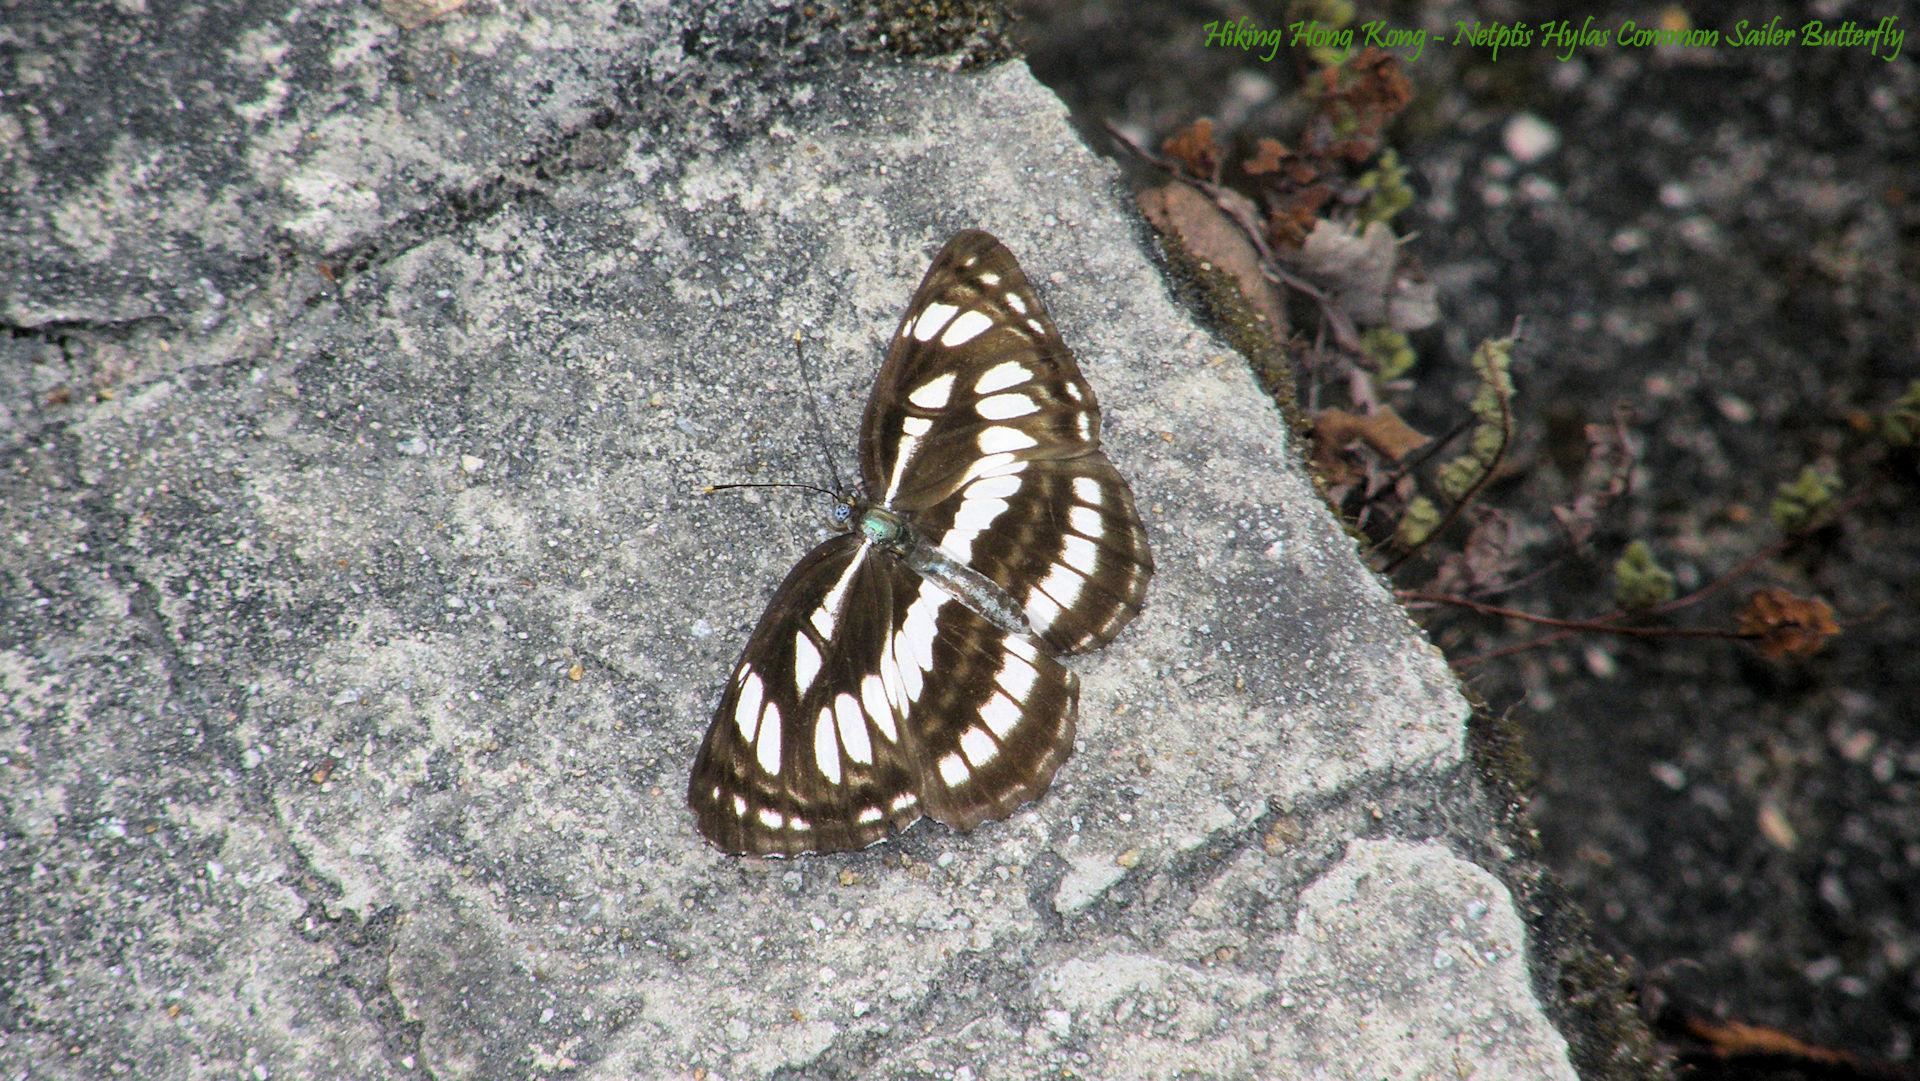 Hong-Kong-Butterfly-Netptis-Hylas-Common-Sailer-Butterfly-Hiking-Hong-Kong-wallpaper-wpc5805981